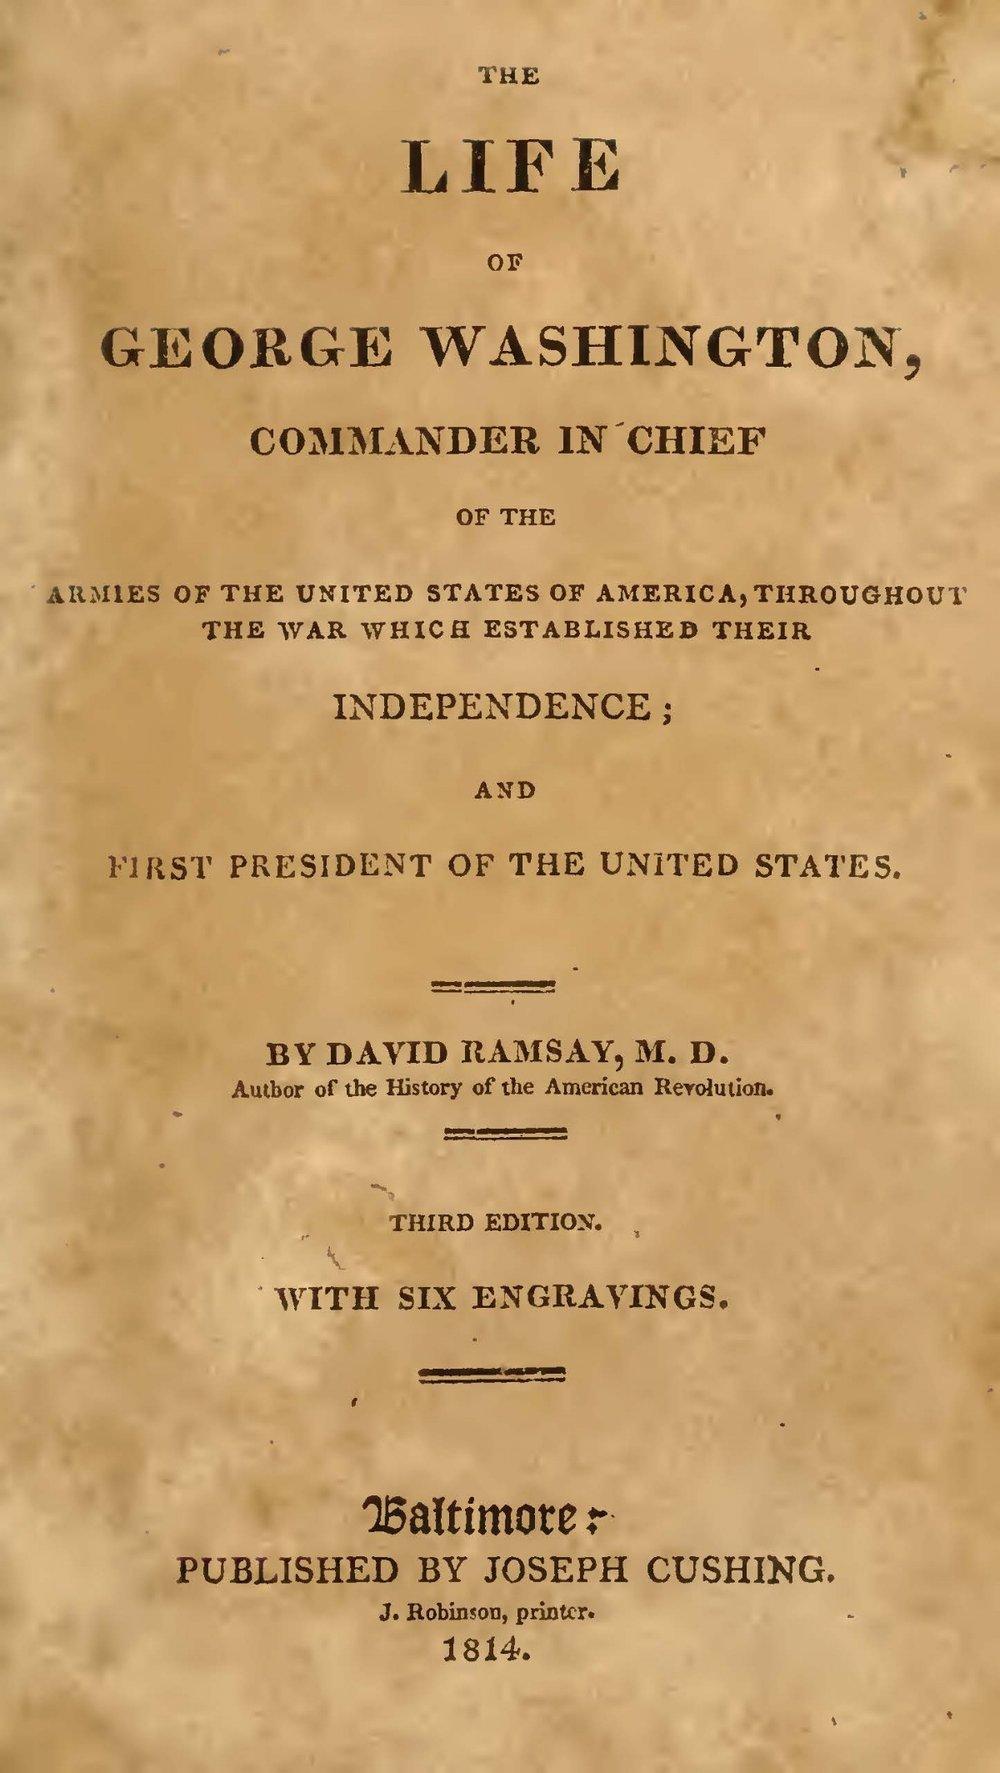 Ramsay, David, The Life of George Washington Title Page.jpg